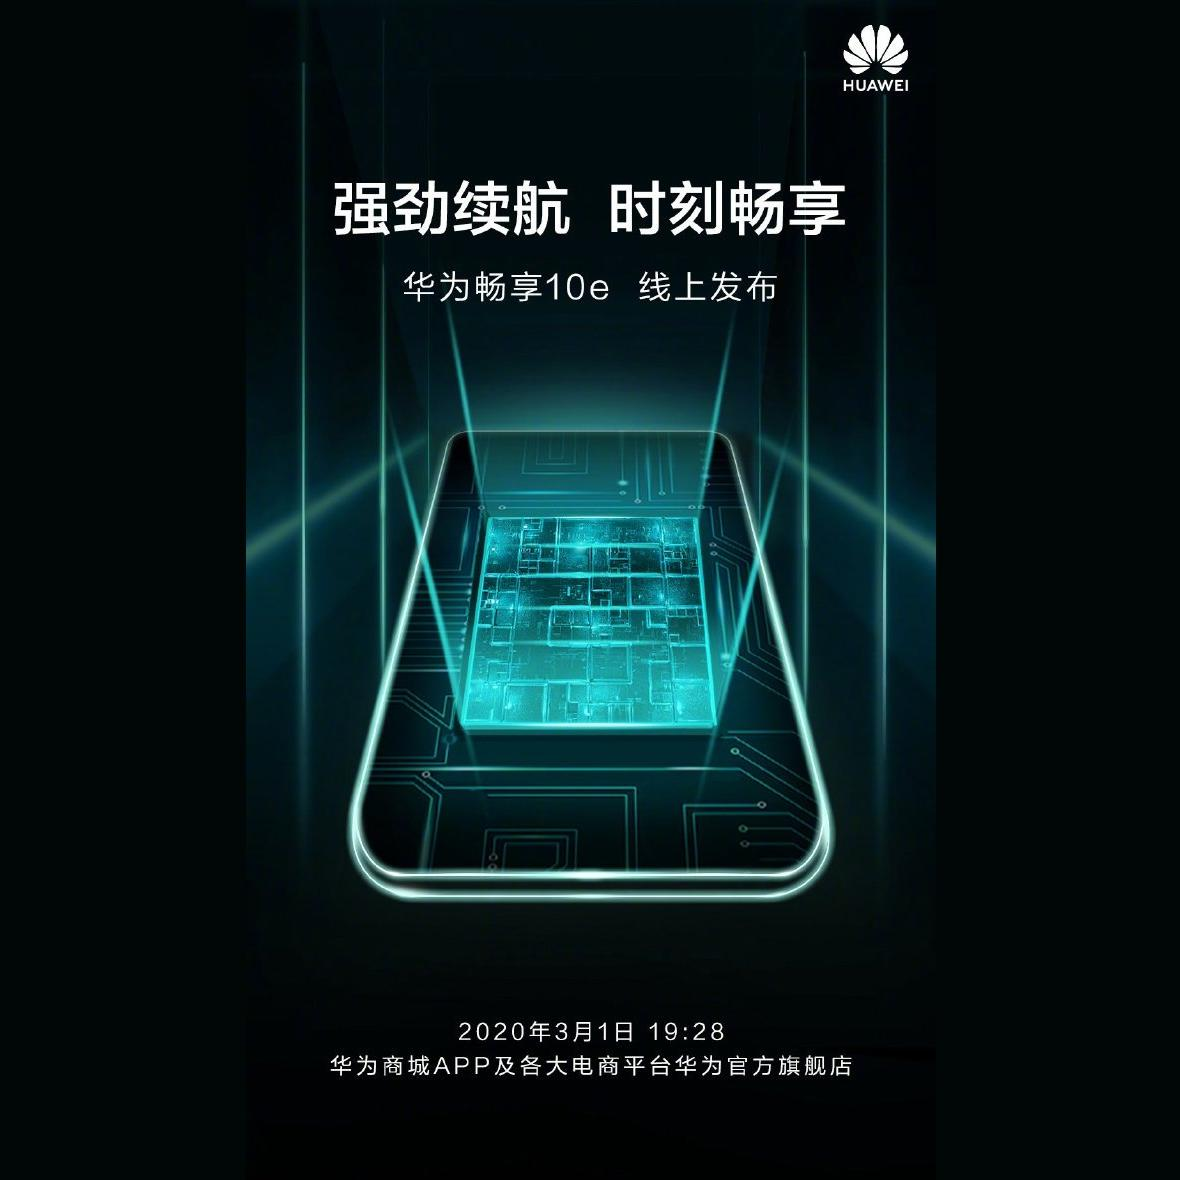 Huawei Enjoy 10e, 1 Mart'ta tanıtılacak